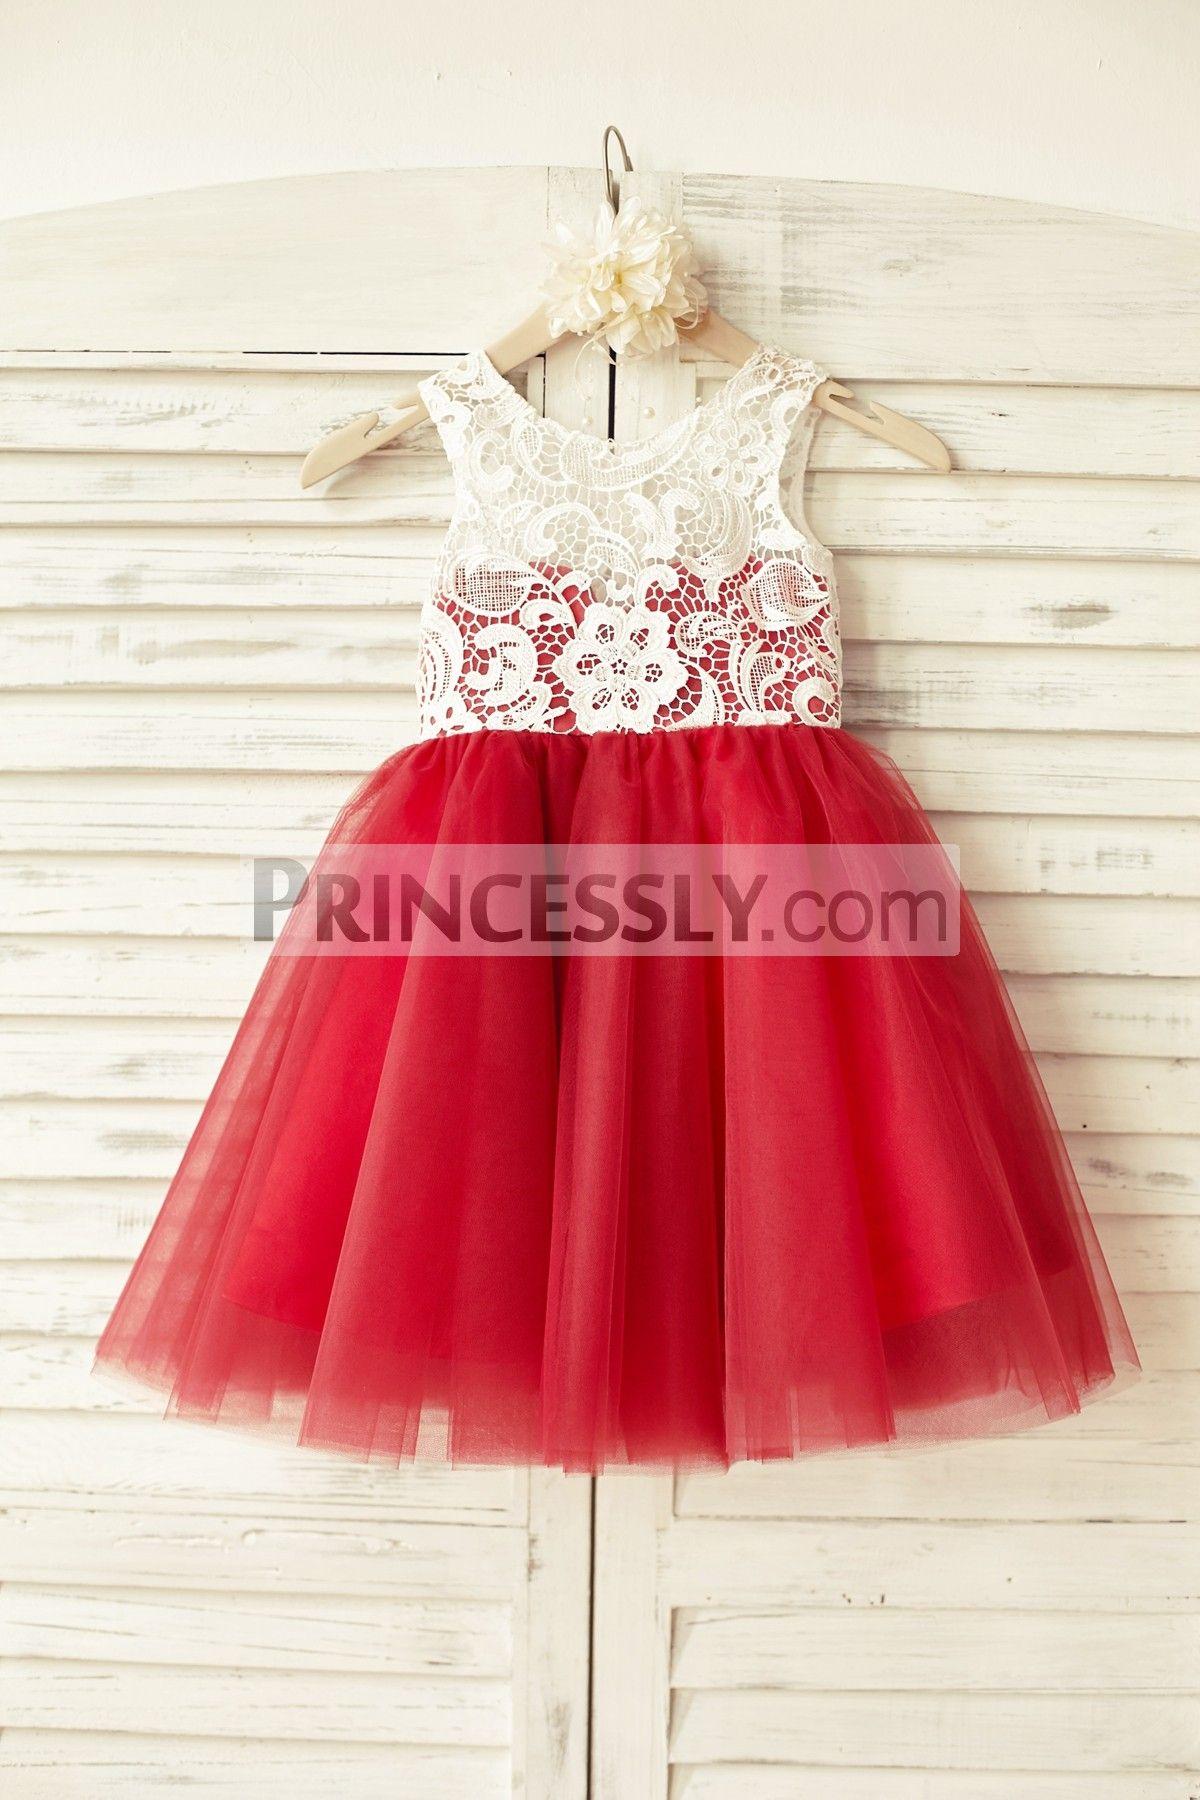 Blush pink girl dress  Ivory Lace Blush Pink Tulle Flower Girl Dress  Lace Girls dresses